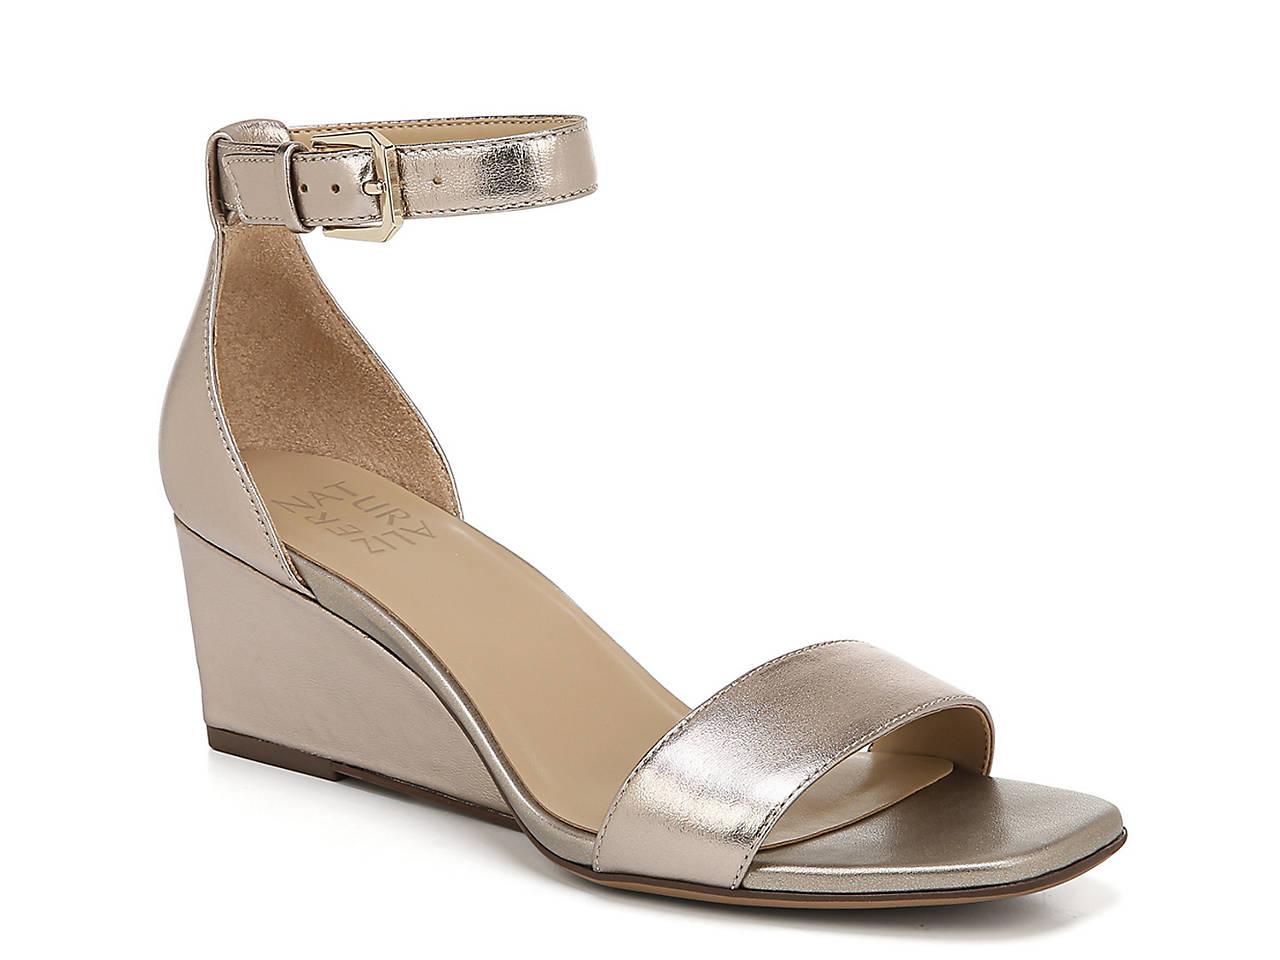 5040c59ed16 Zenia Wedge Sandal